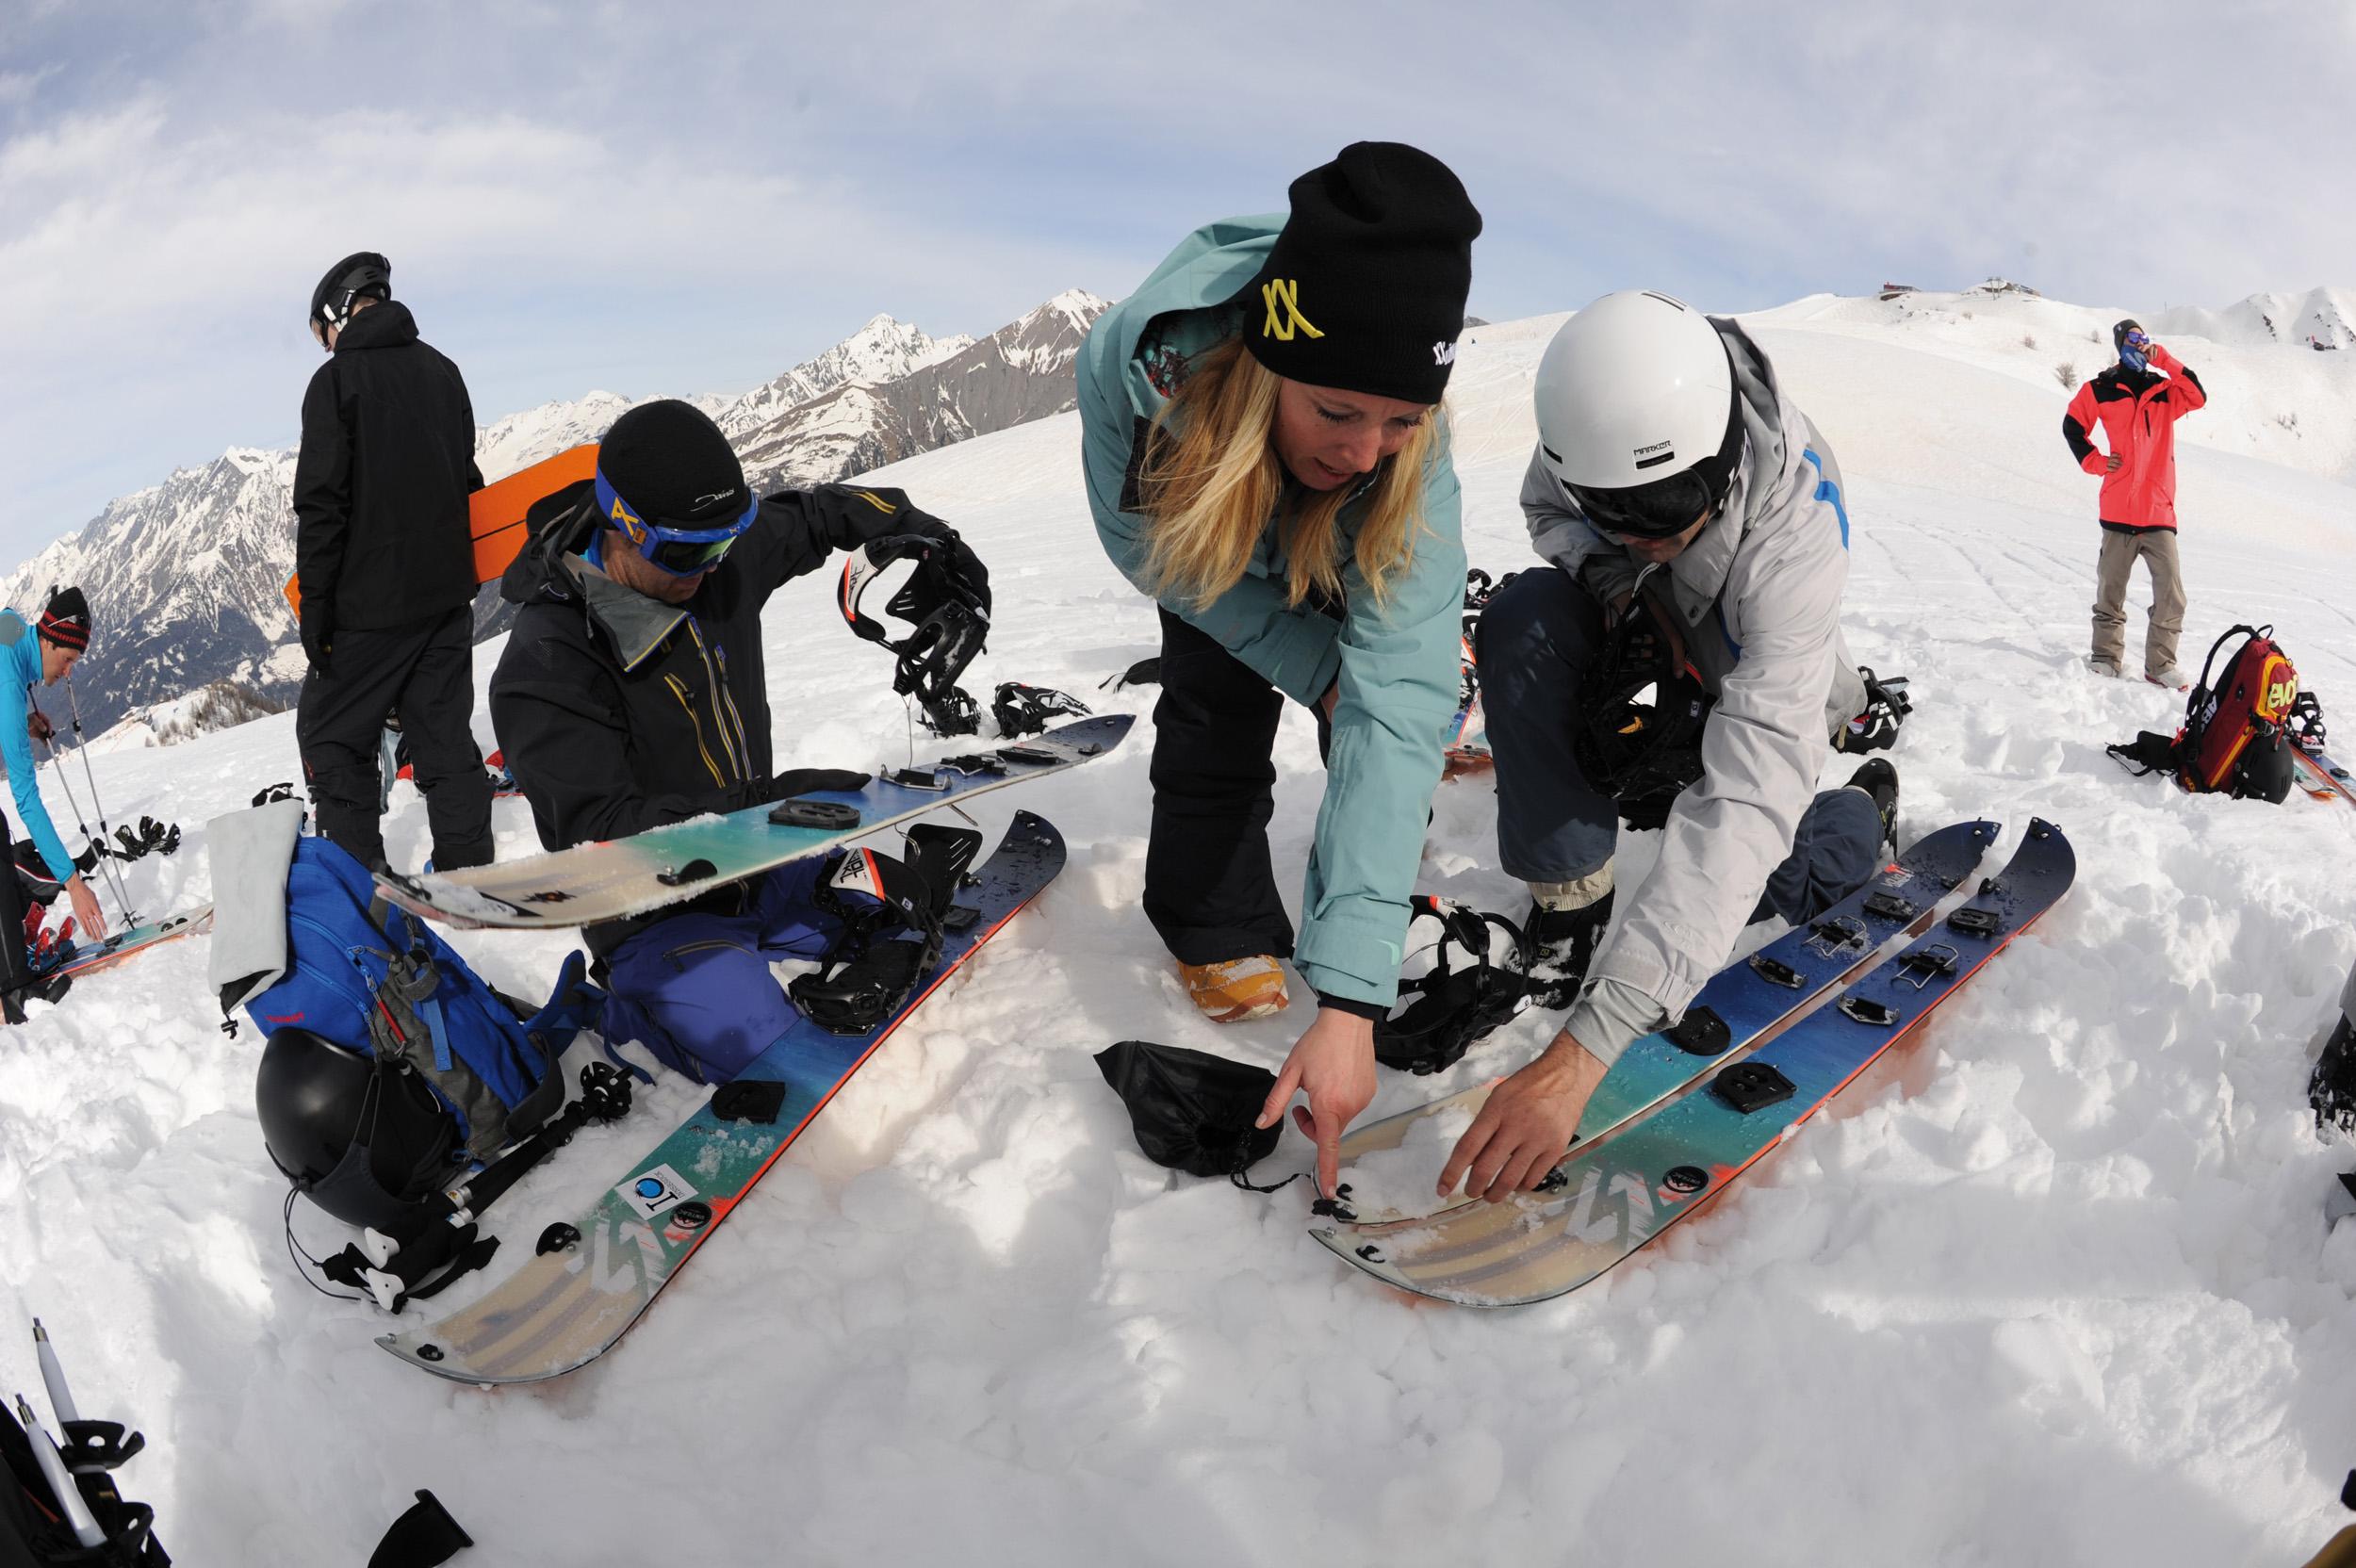 SPLITBOARD: SIENTE LA MONTAÑA CON TU SNOWBOARD